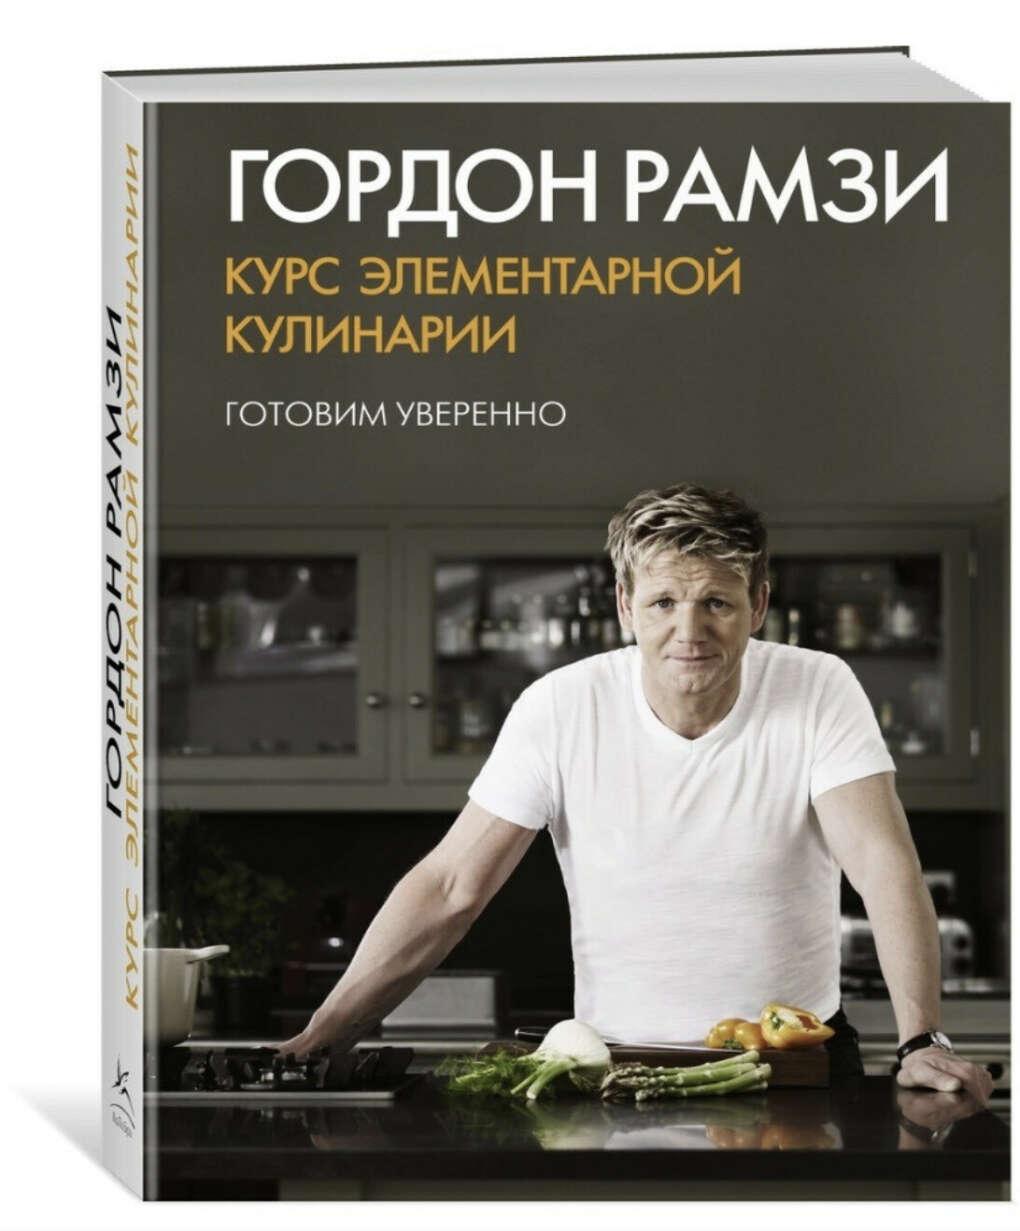 Рамзи Гордон Курс элементарной кулинарии. Готовим уверенно